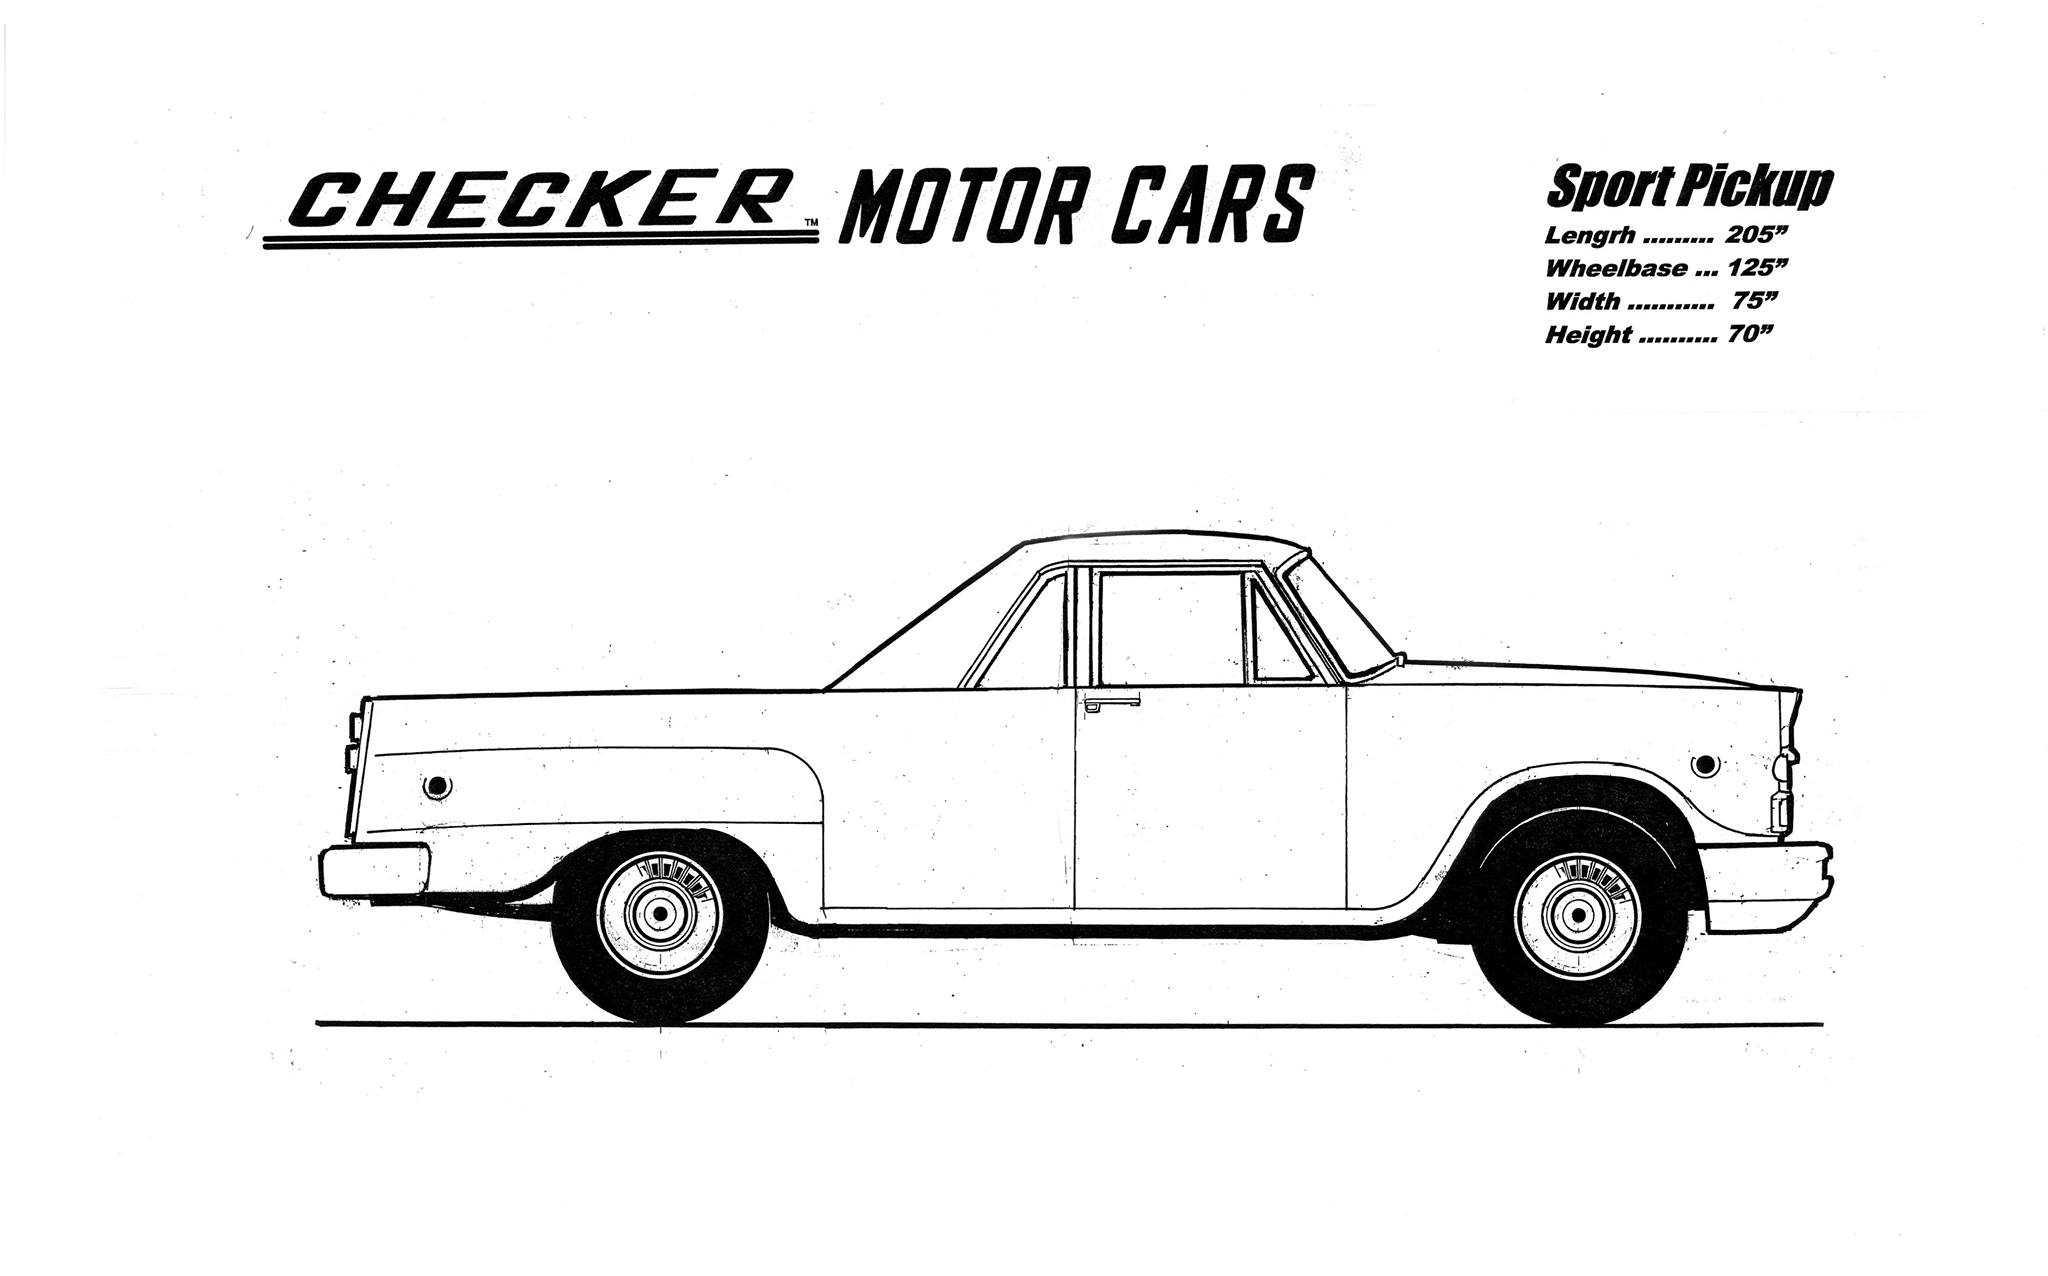 final-detail-Sport-pick-up-16-tires--Front-bumpet-to-meet-5-MPH-crash